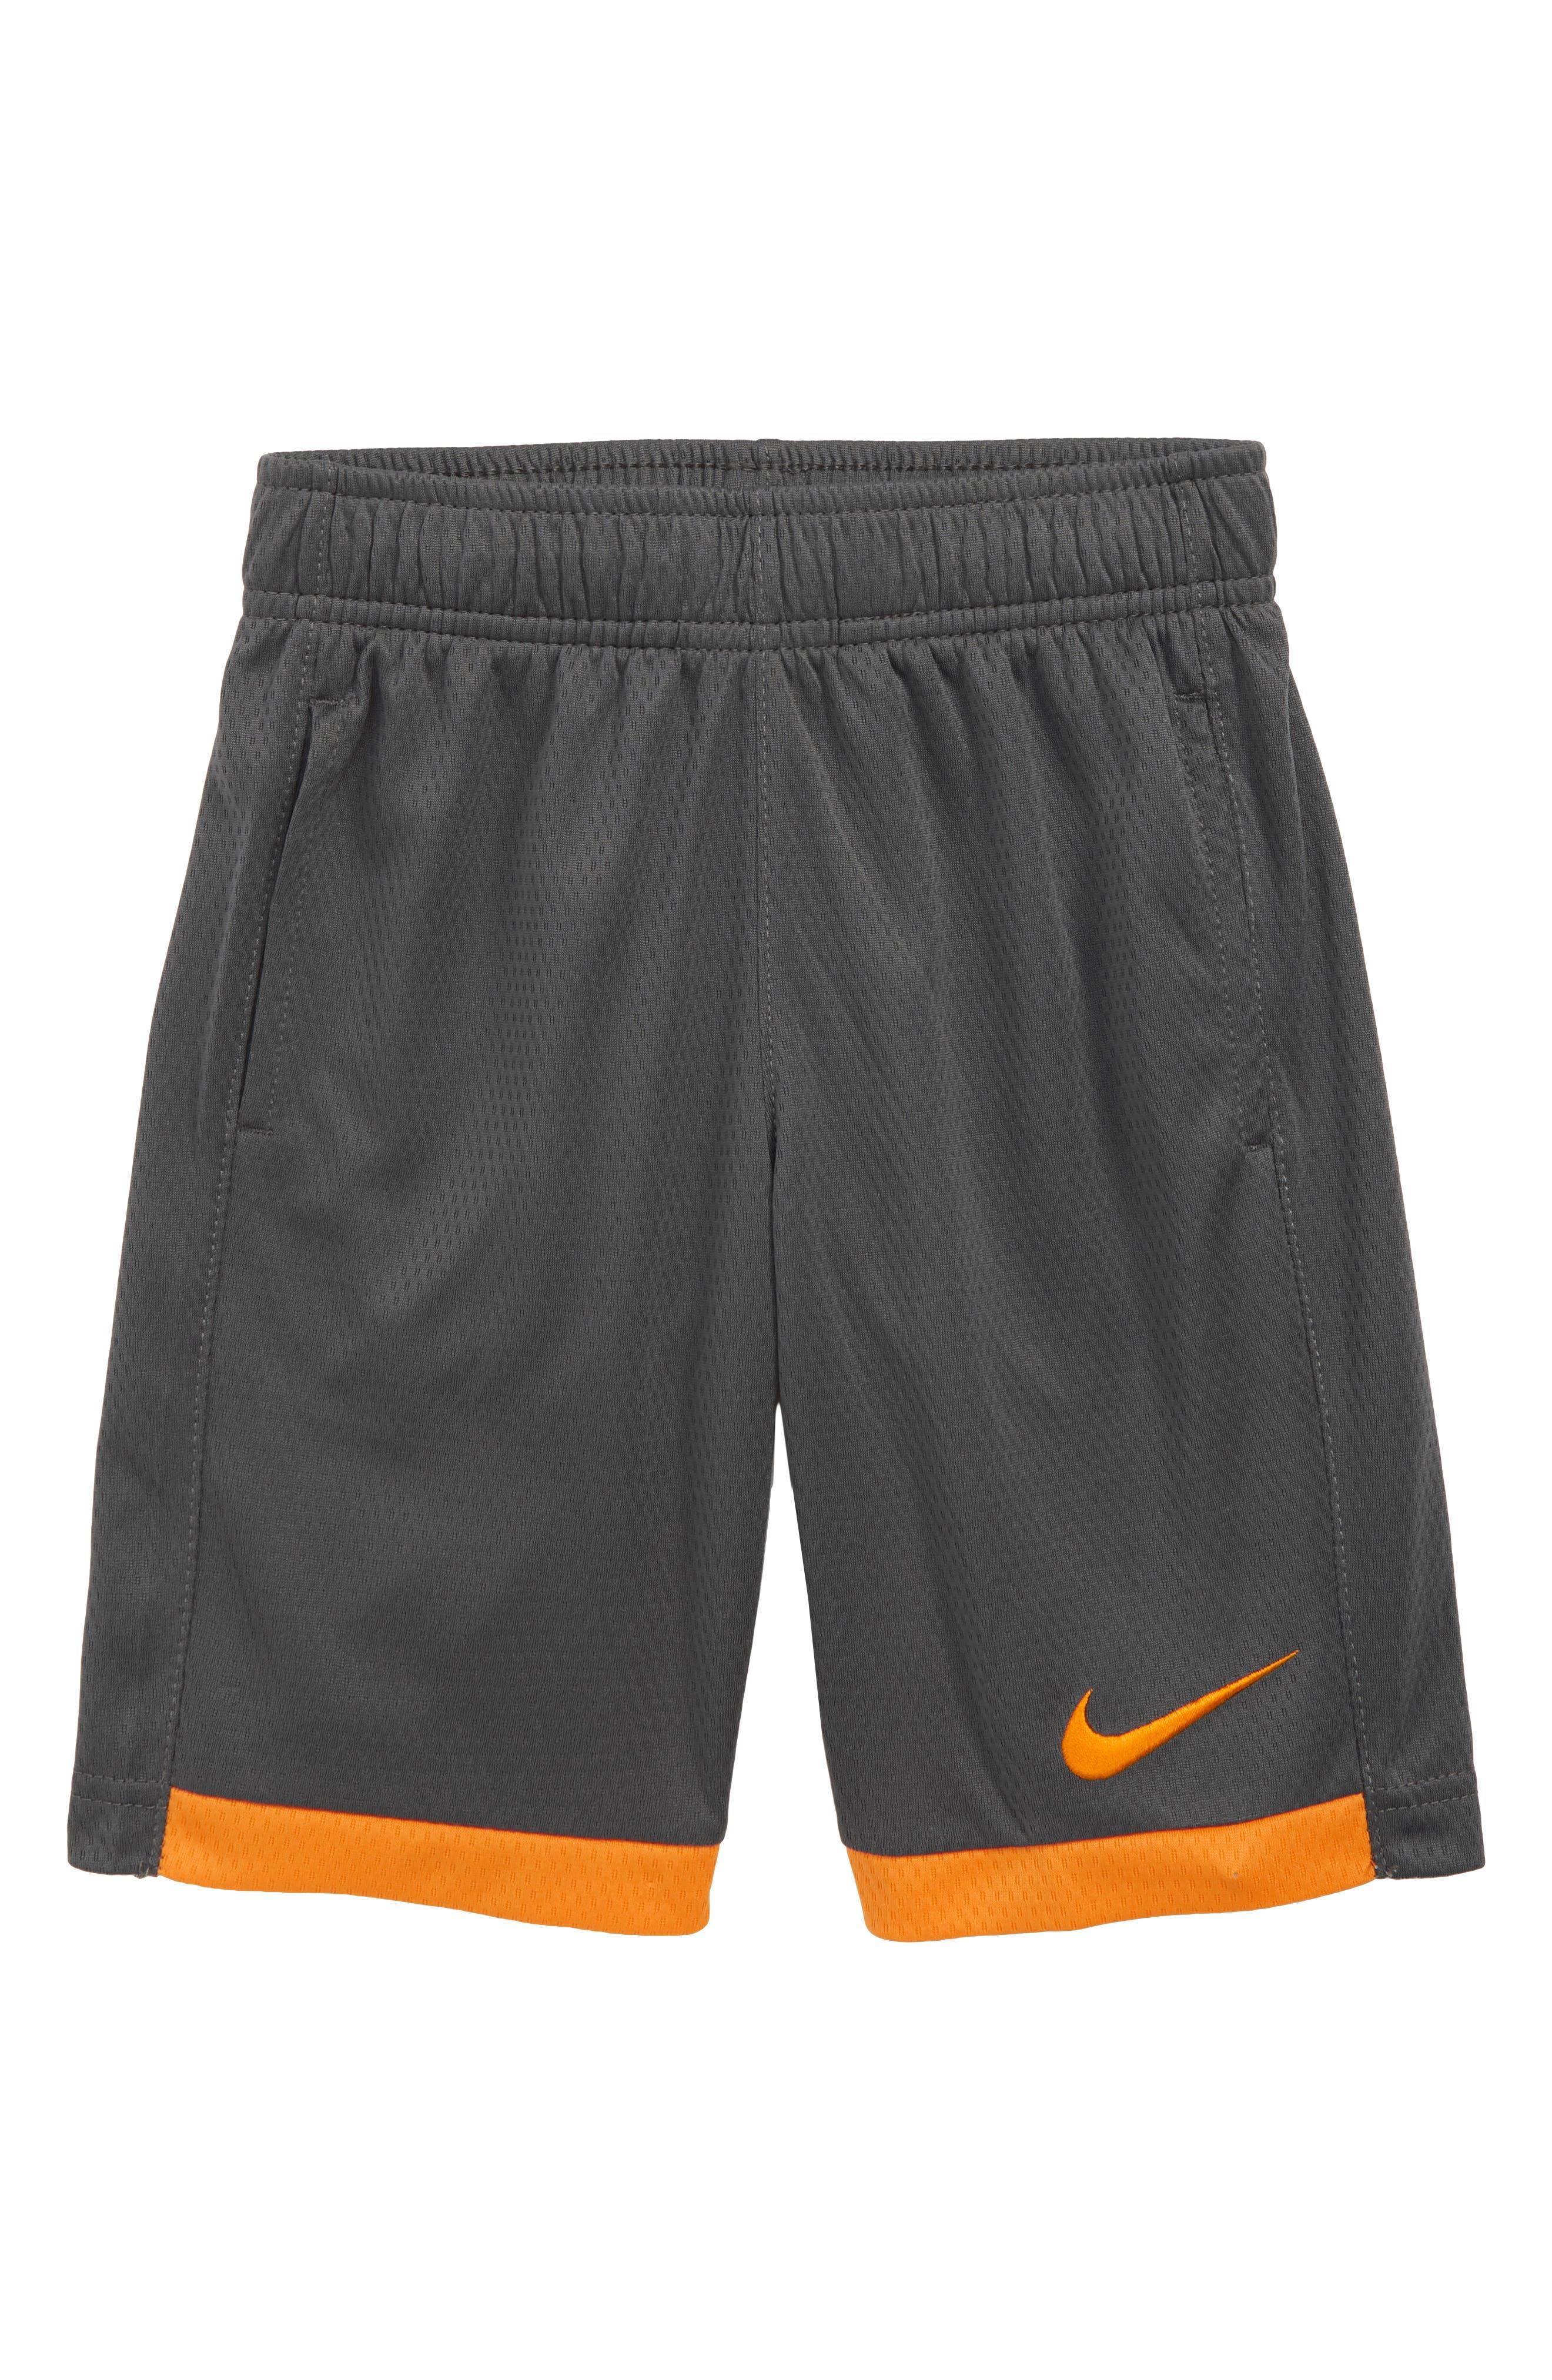 9290142a52fd boys nike shorts